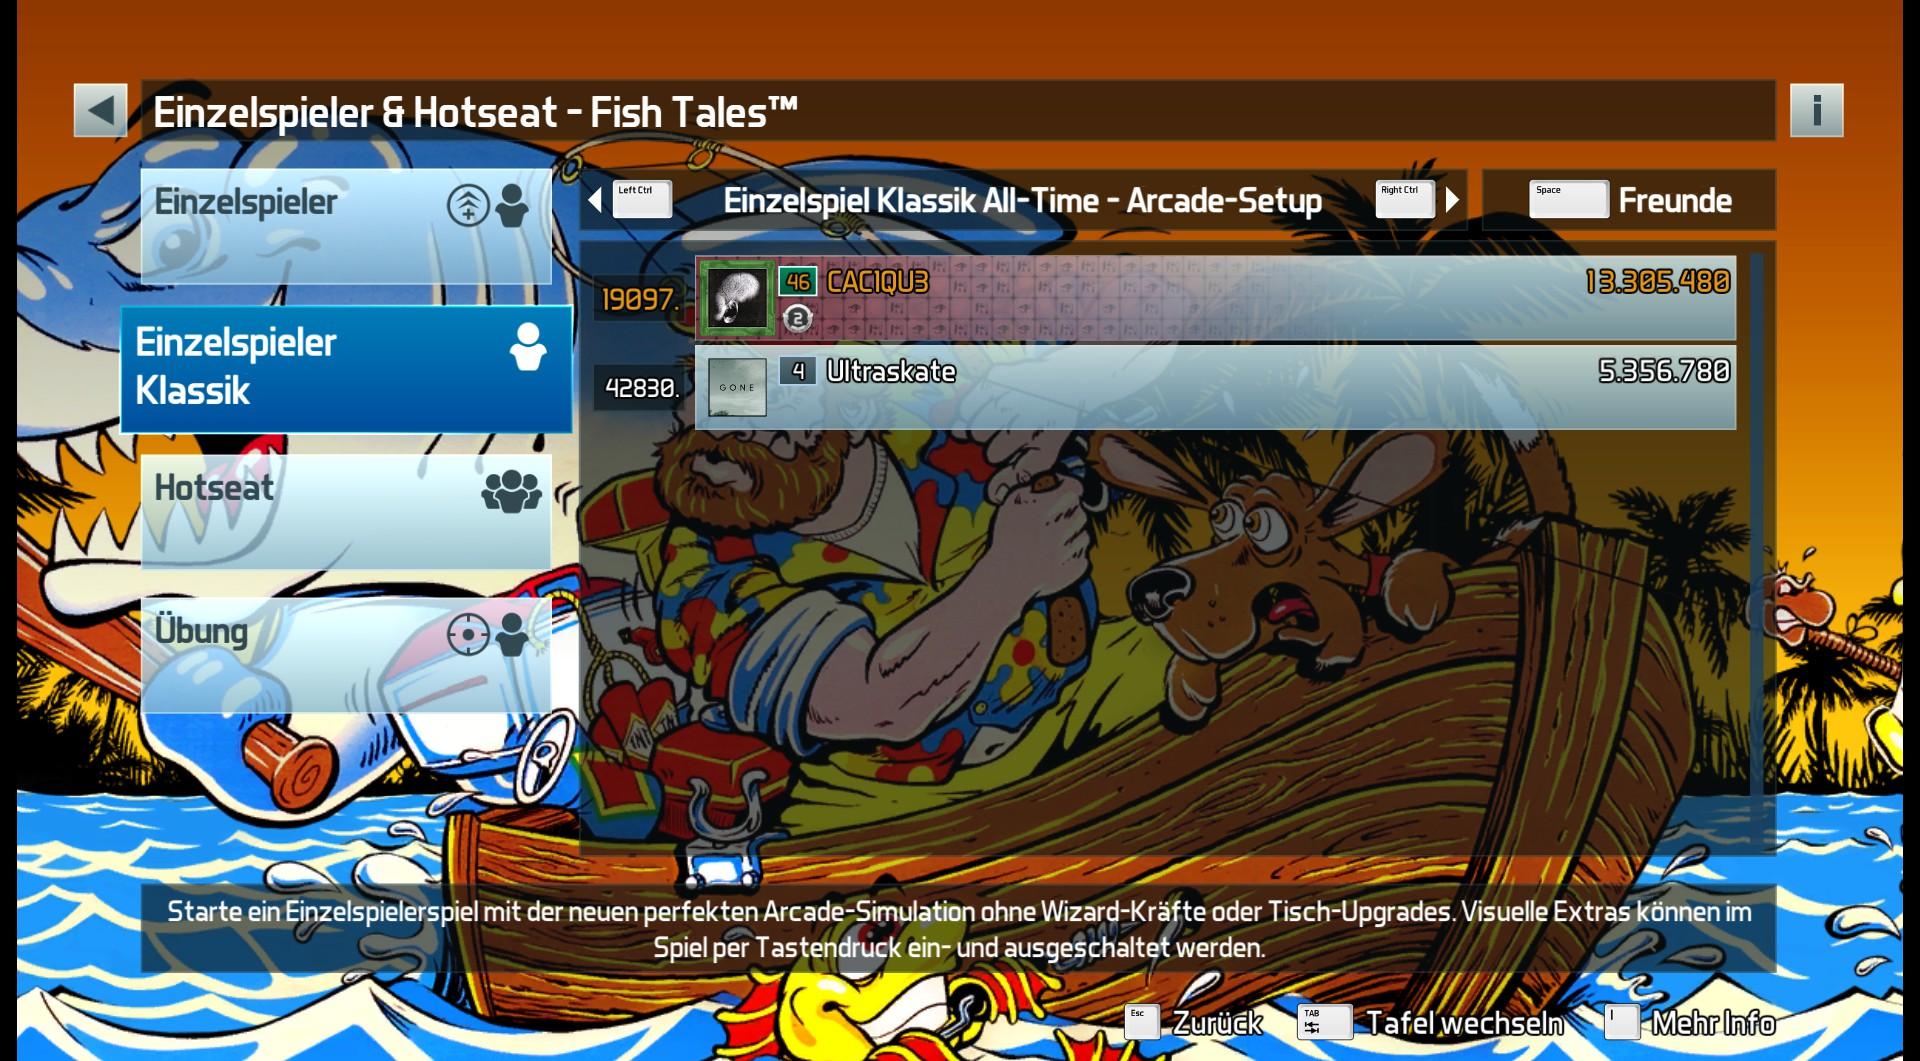 Pinball FX3: Fish Tales [Arcade] 13,305,480 points